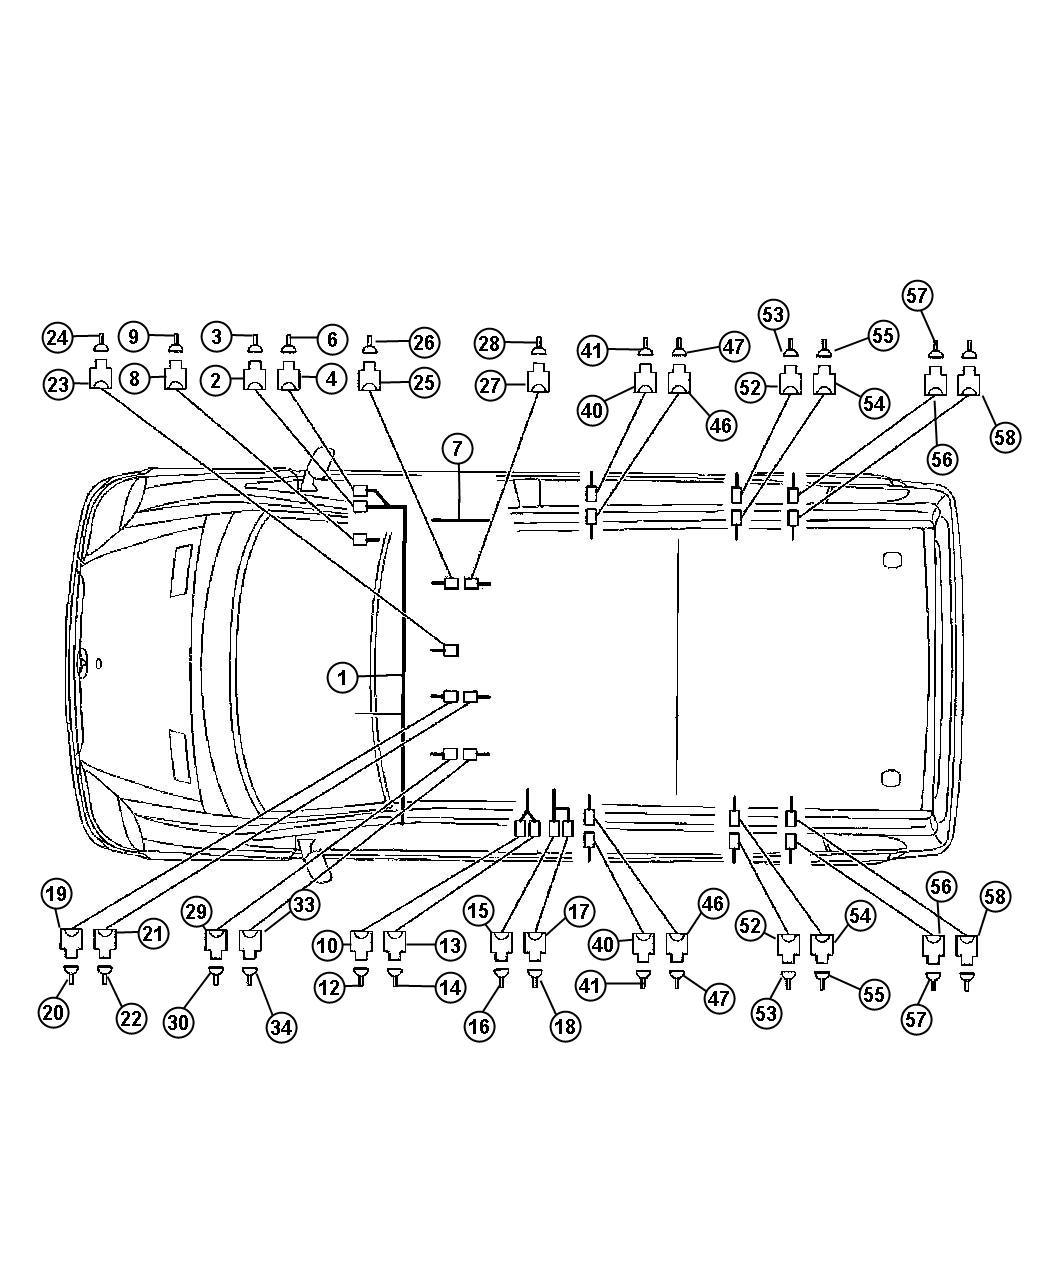 Dodge SPRINTER Connector. Wiring. [4 pin. X64/14], [6 pin